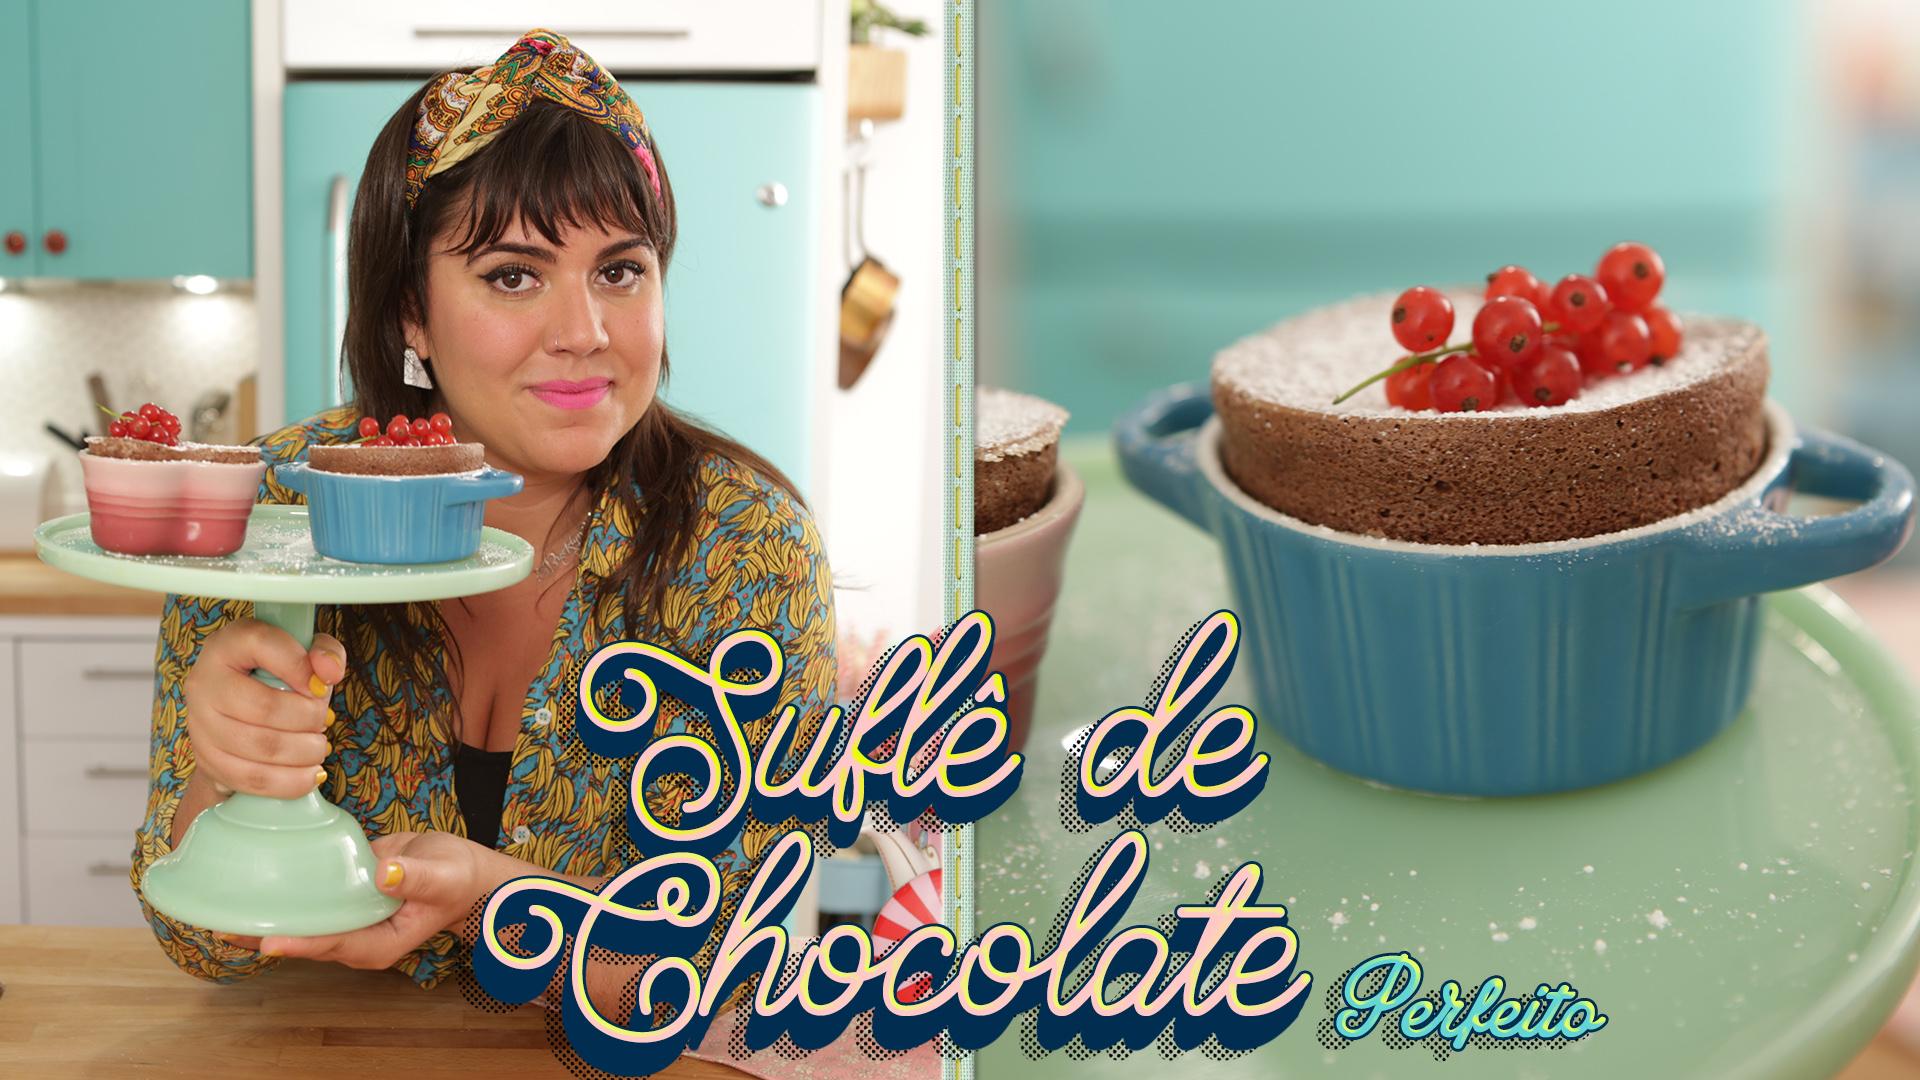 Thumbnail_sufle de chocolate2.jpg